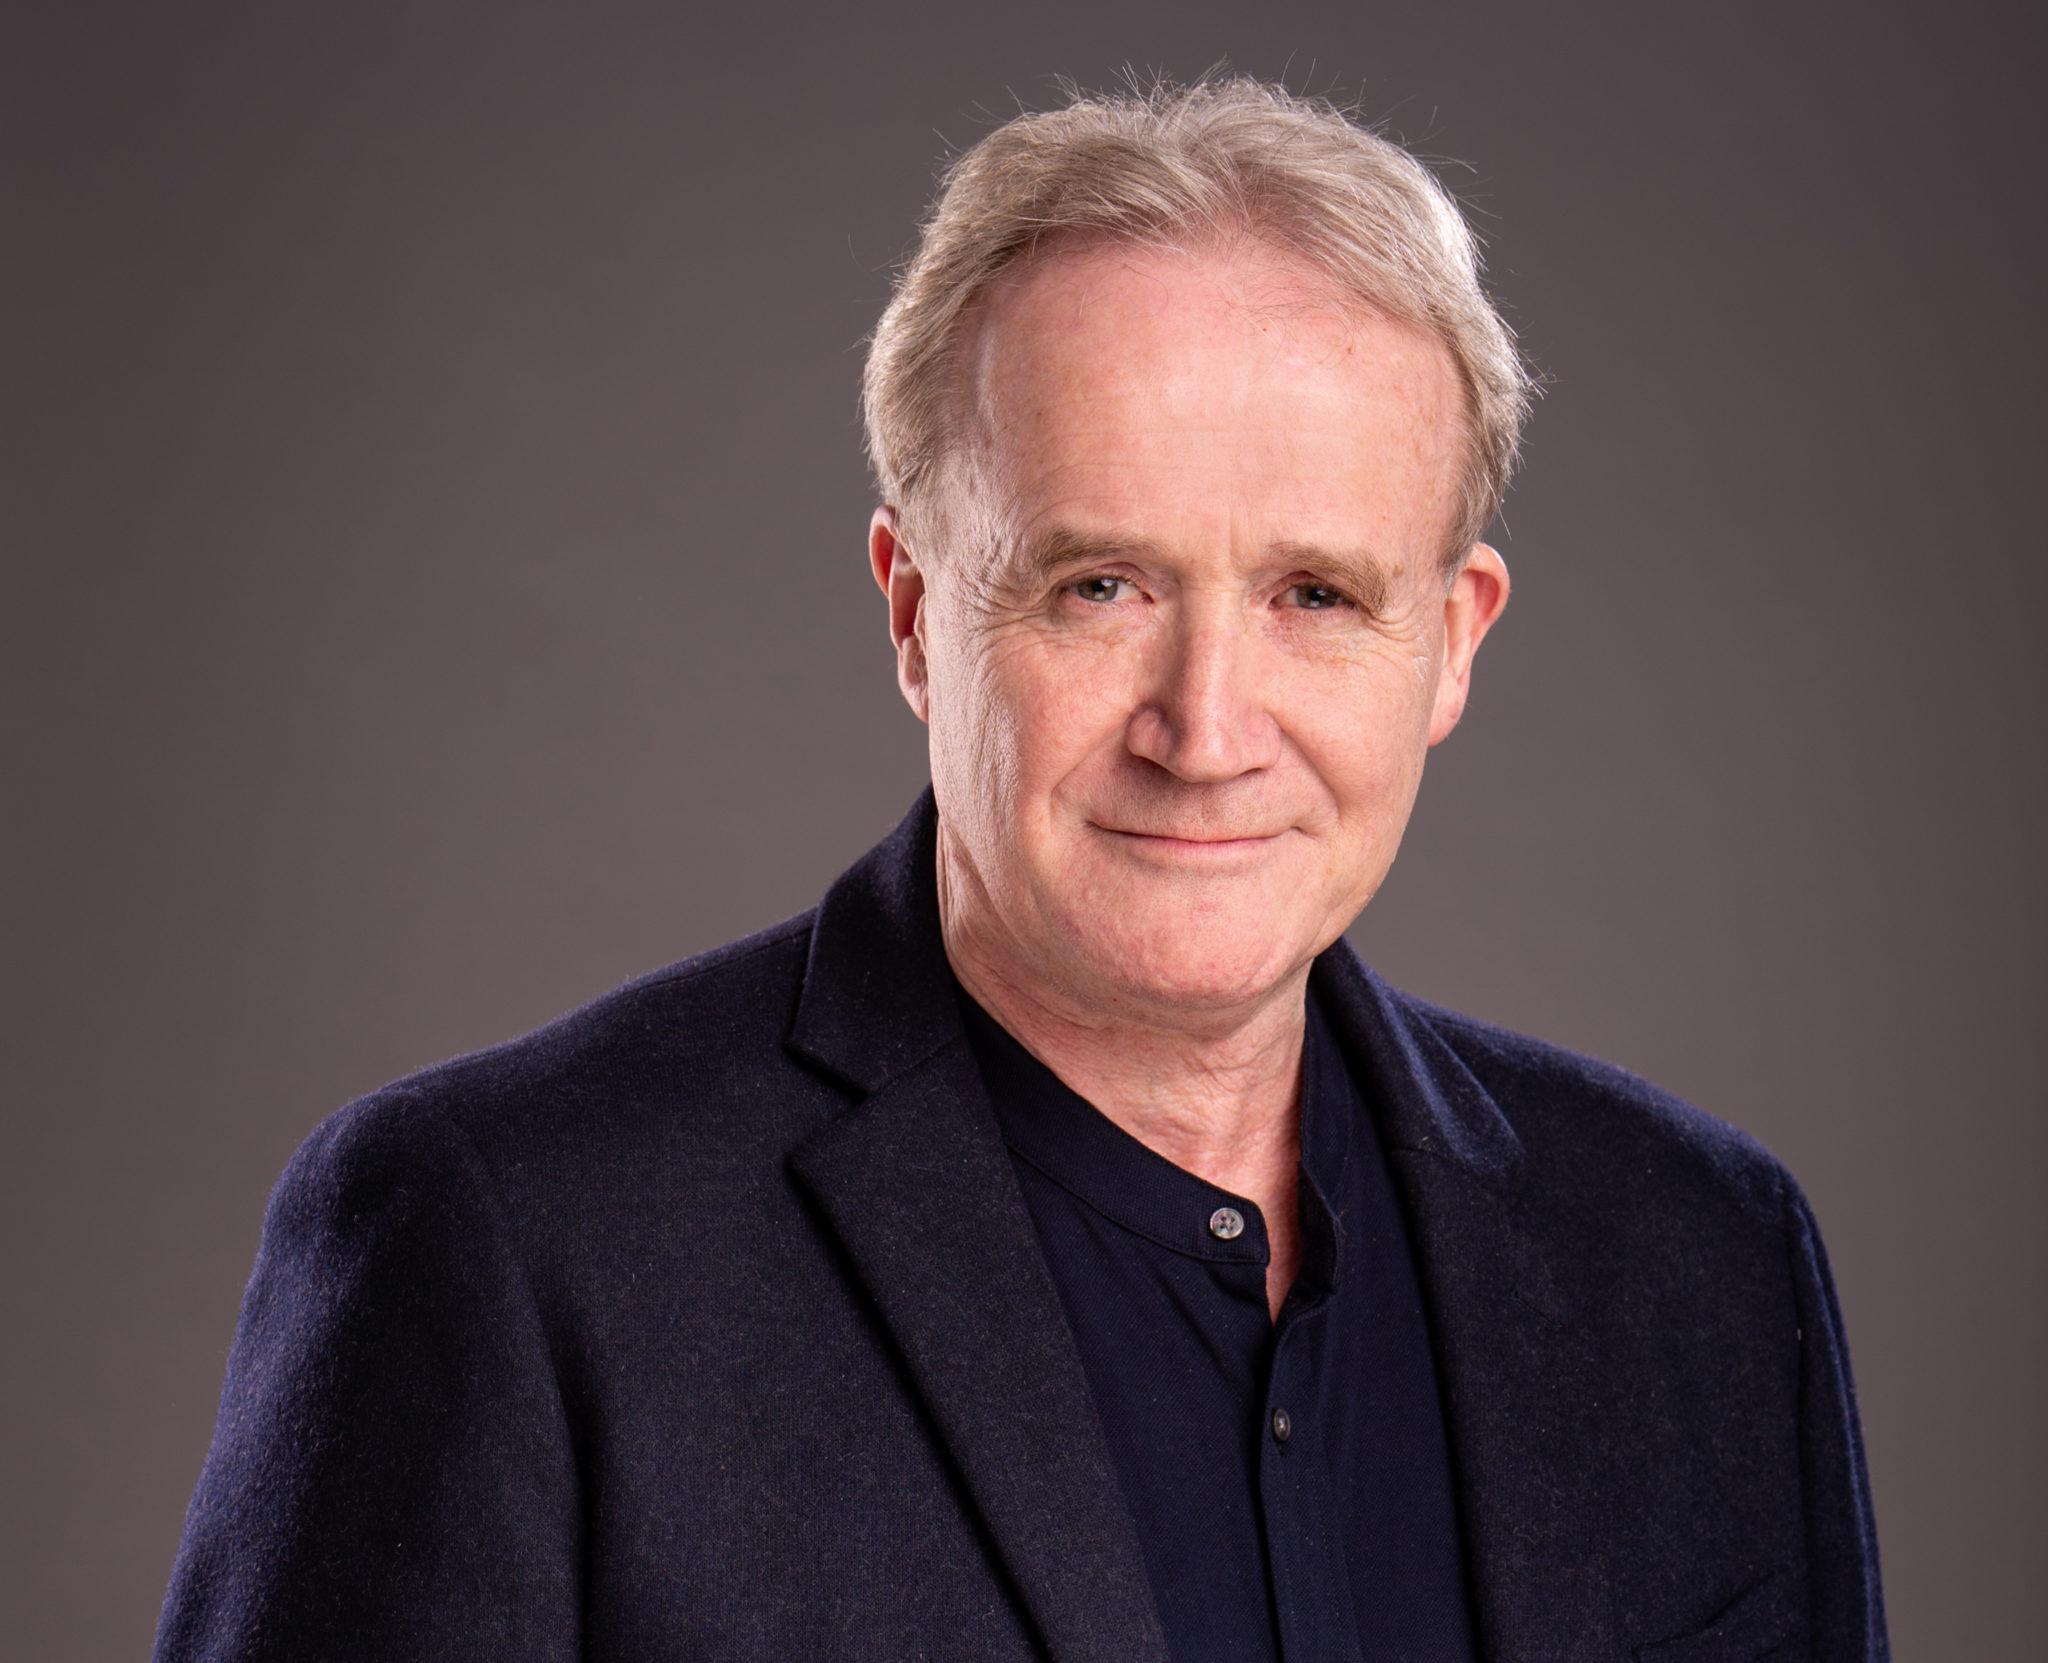 Mike Padgham